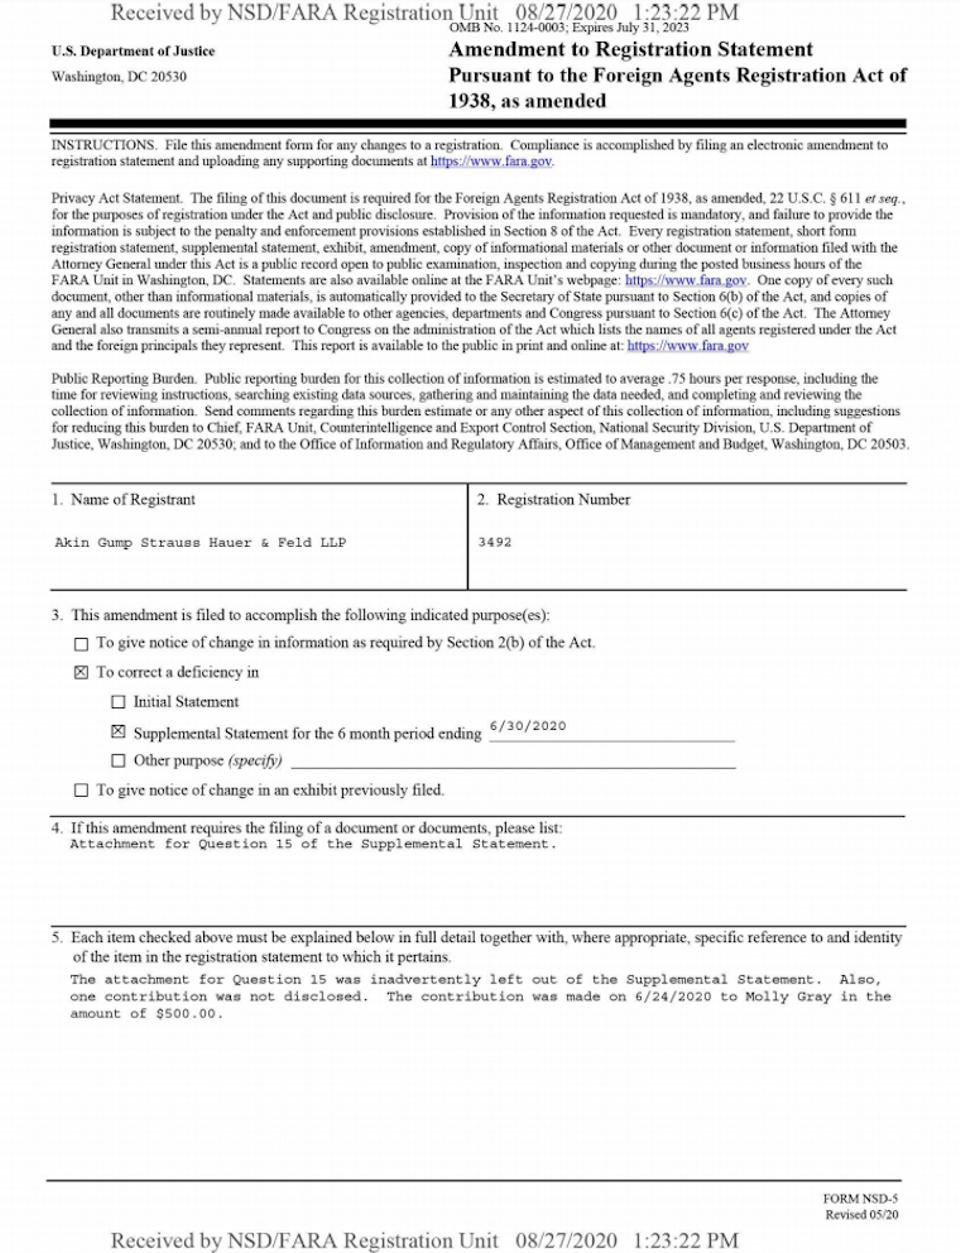 FARA registration unit document showing Akin Gump Strauss Hauer & Feld LLP as a registrant.